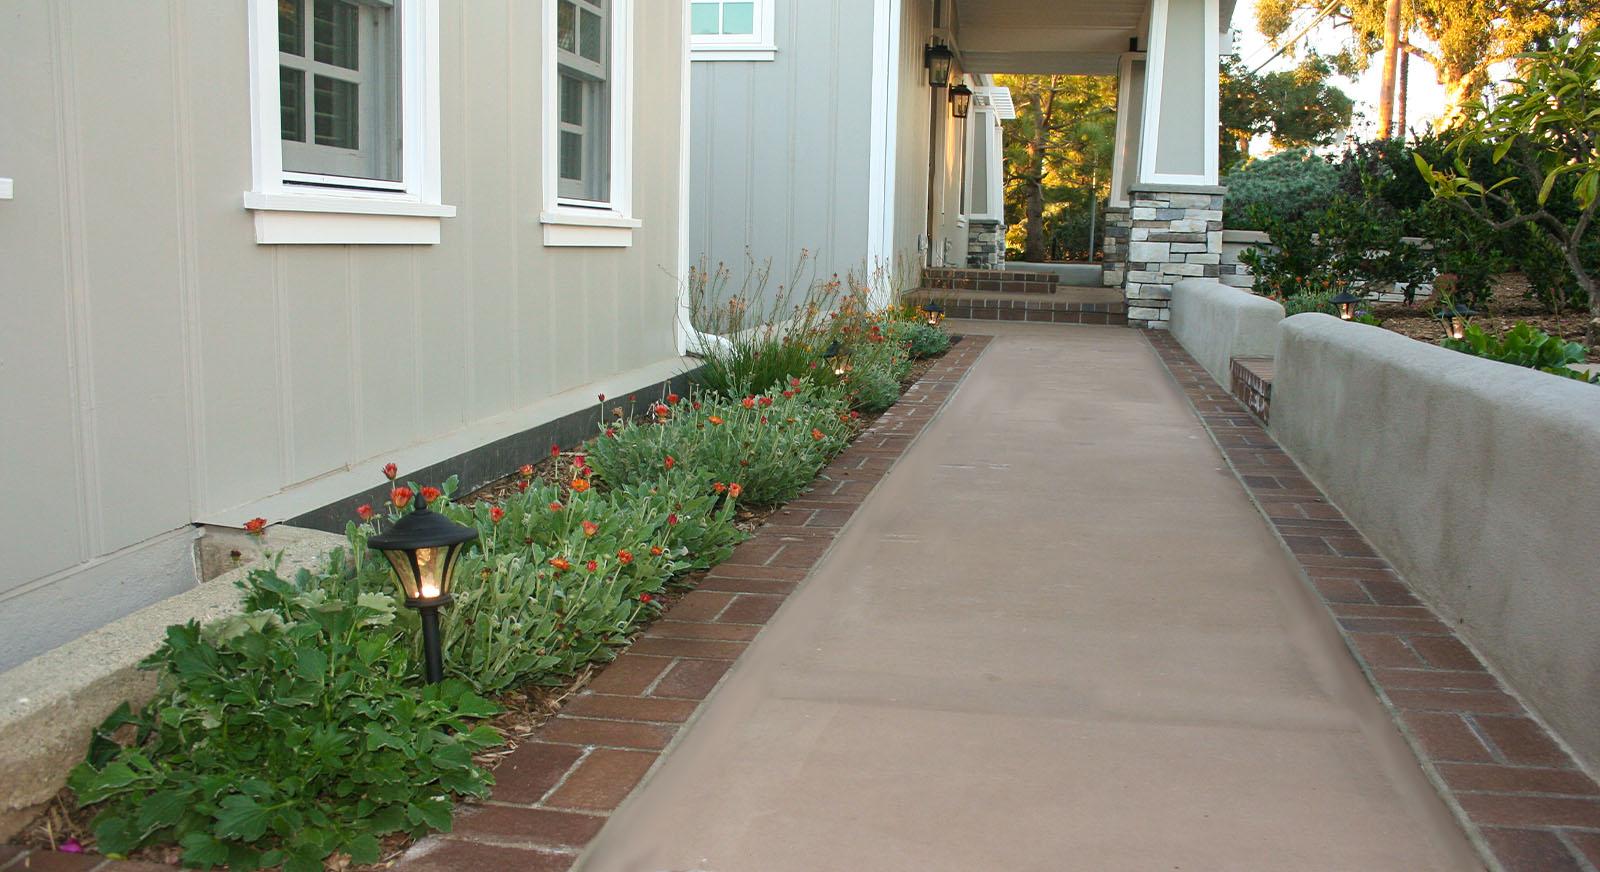 Cross Construction Walk Way, Flower, Plants